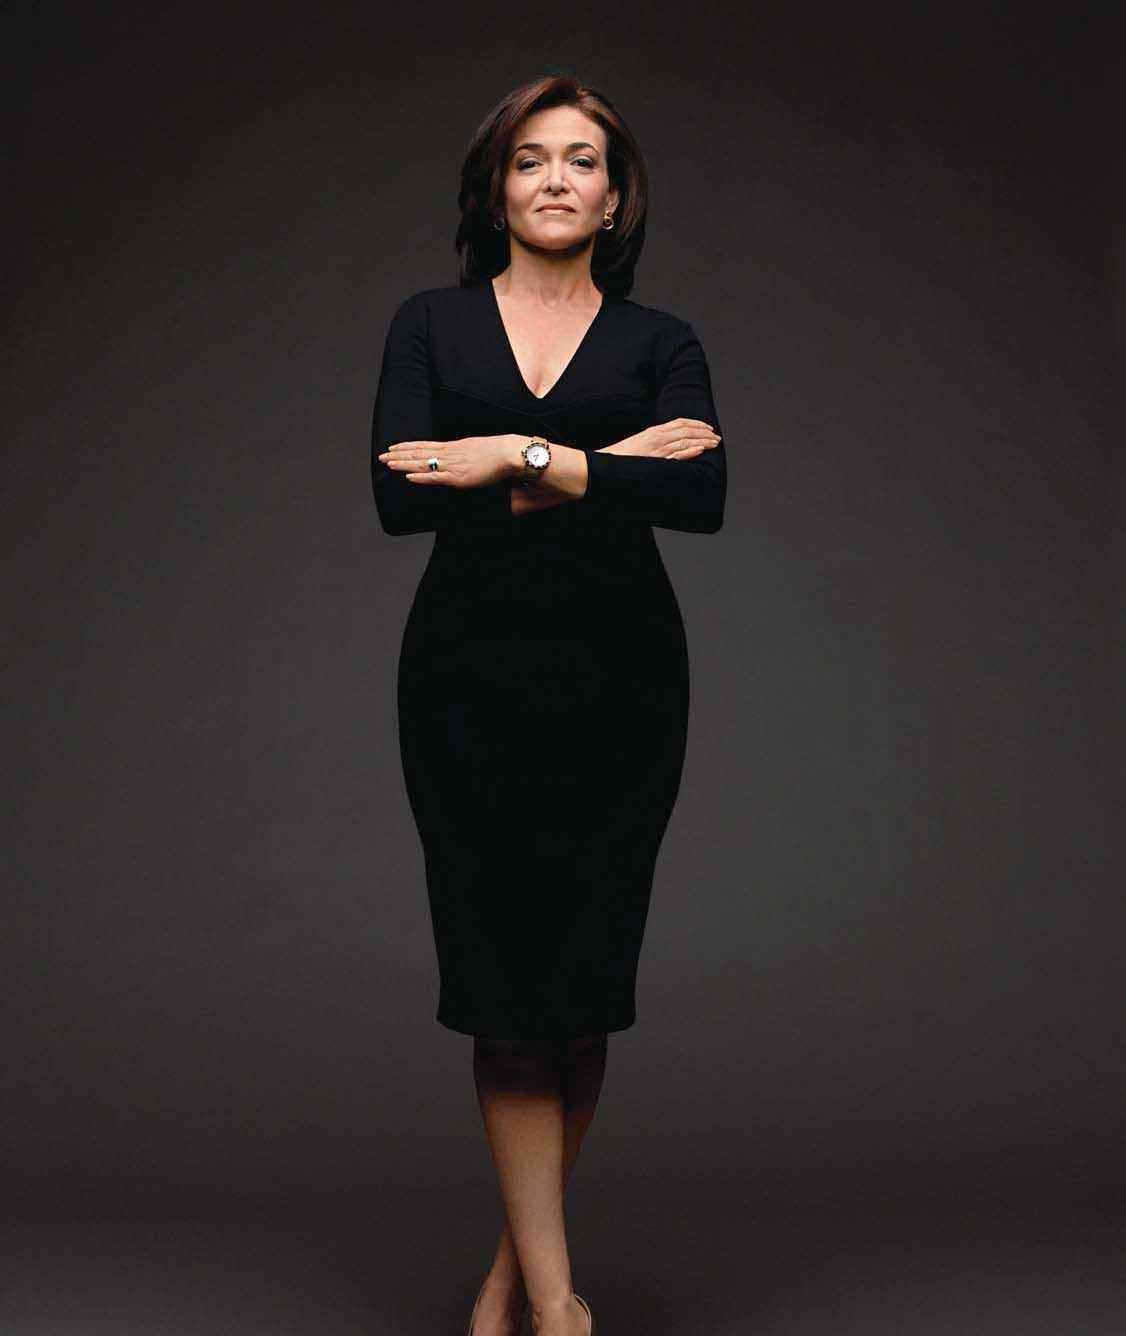 Inside The Mind Of Sheryl Sandberg Sheryl Sandberg Hobbies